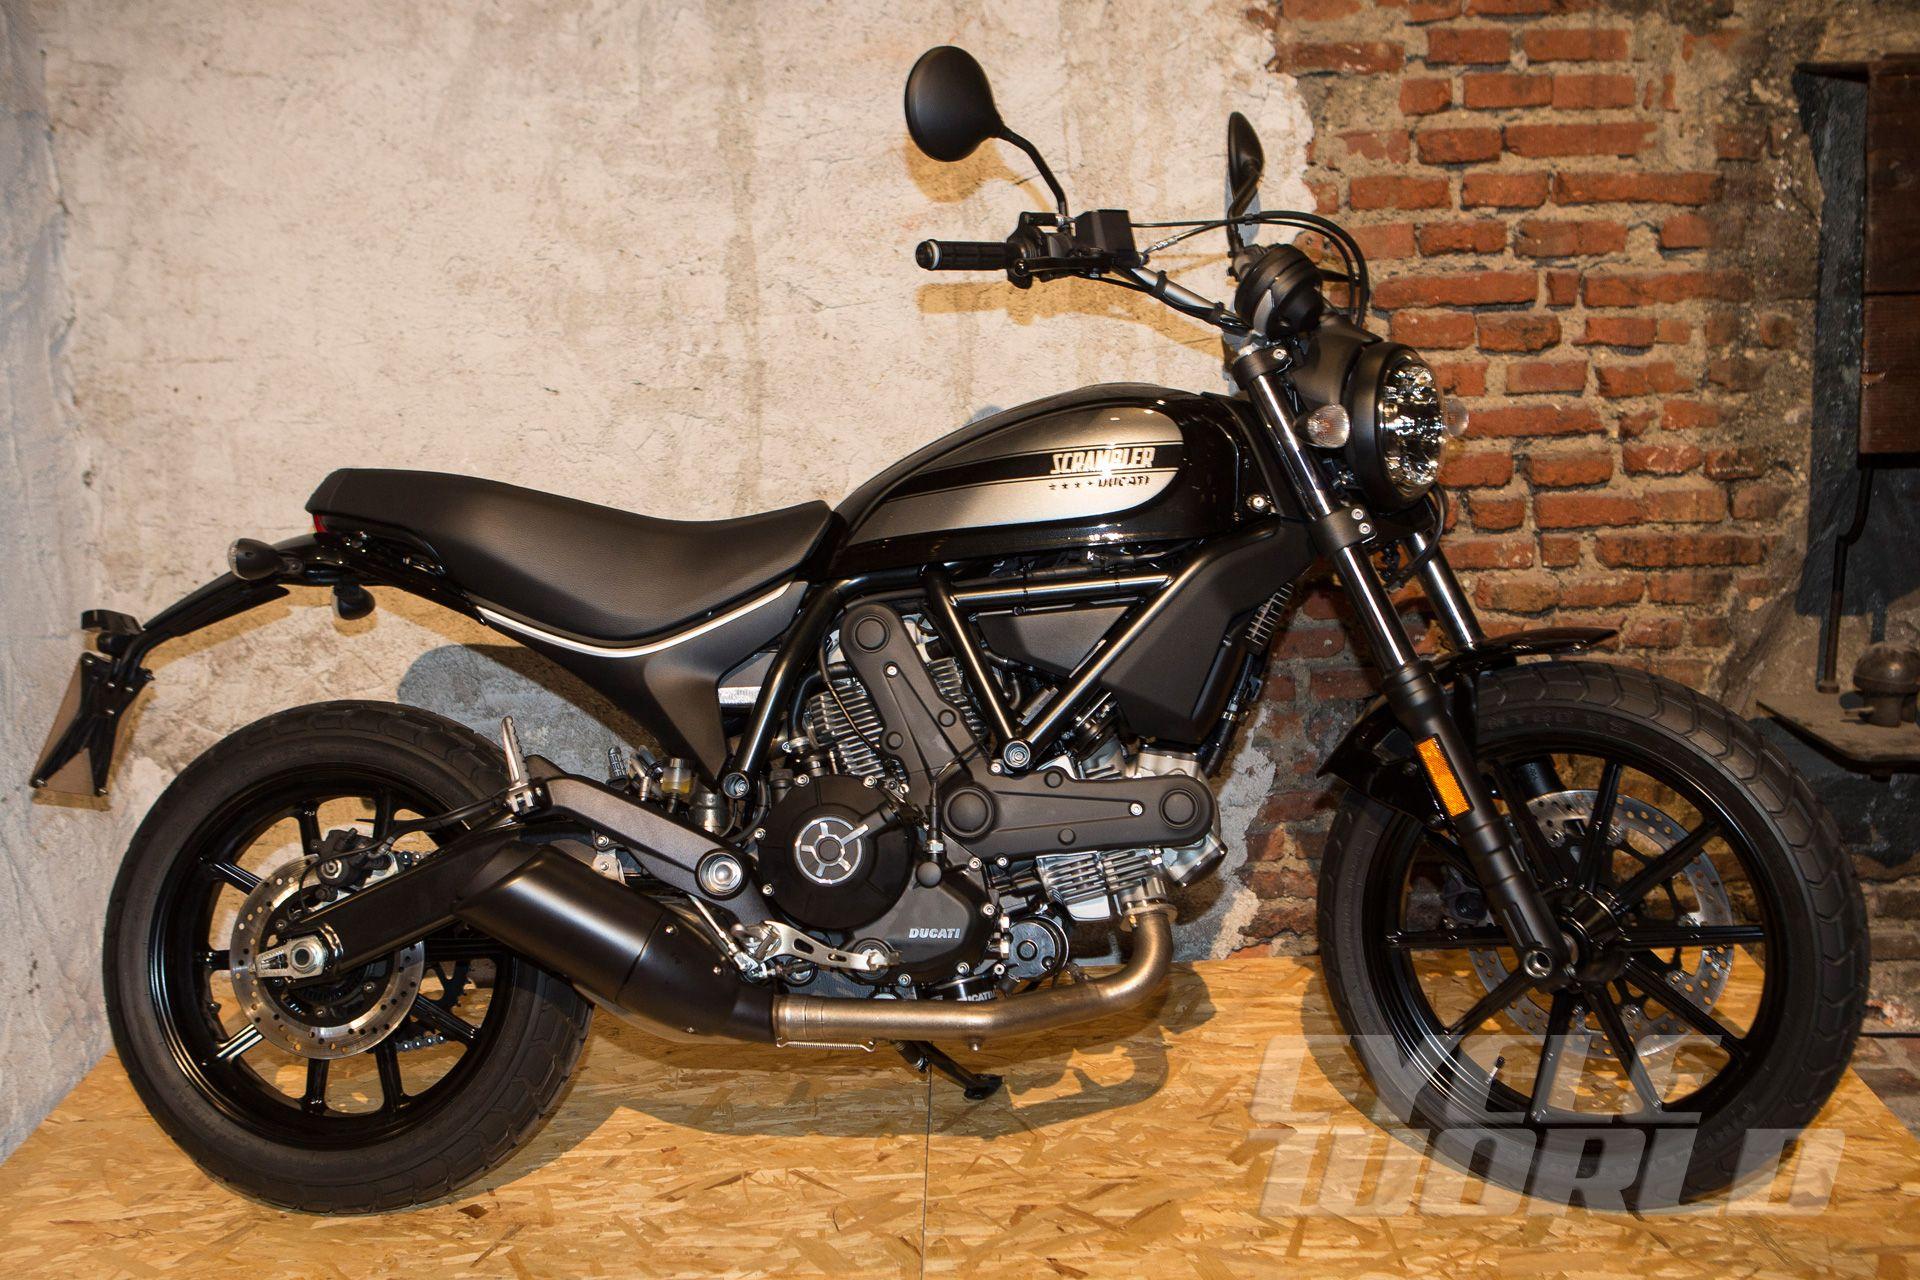 Cycle World - EICMA 2015 FIRST LOOK: 2016 Ducati Scramber ...